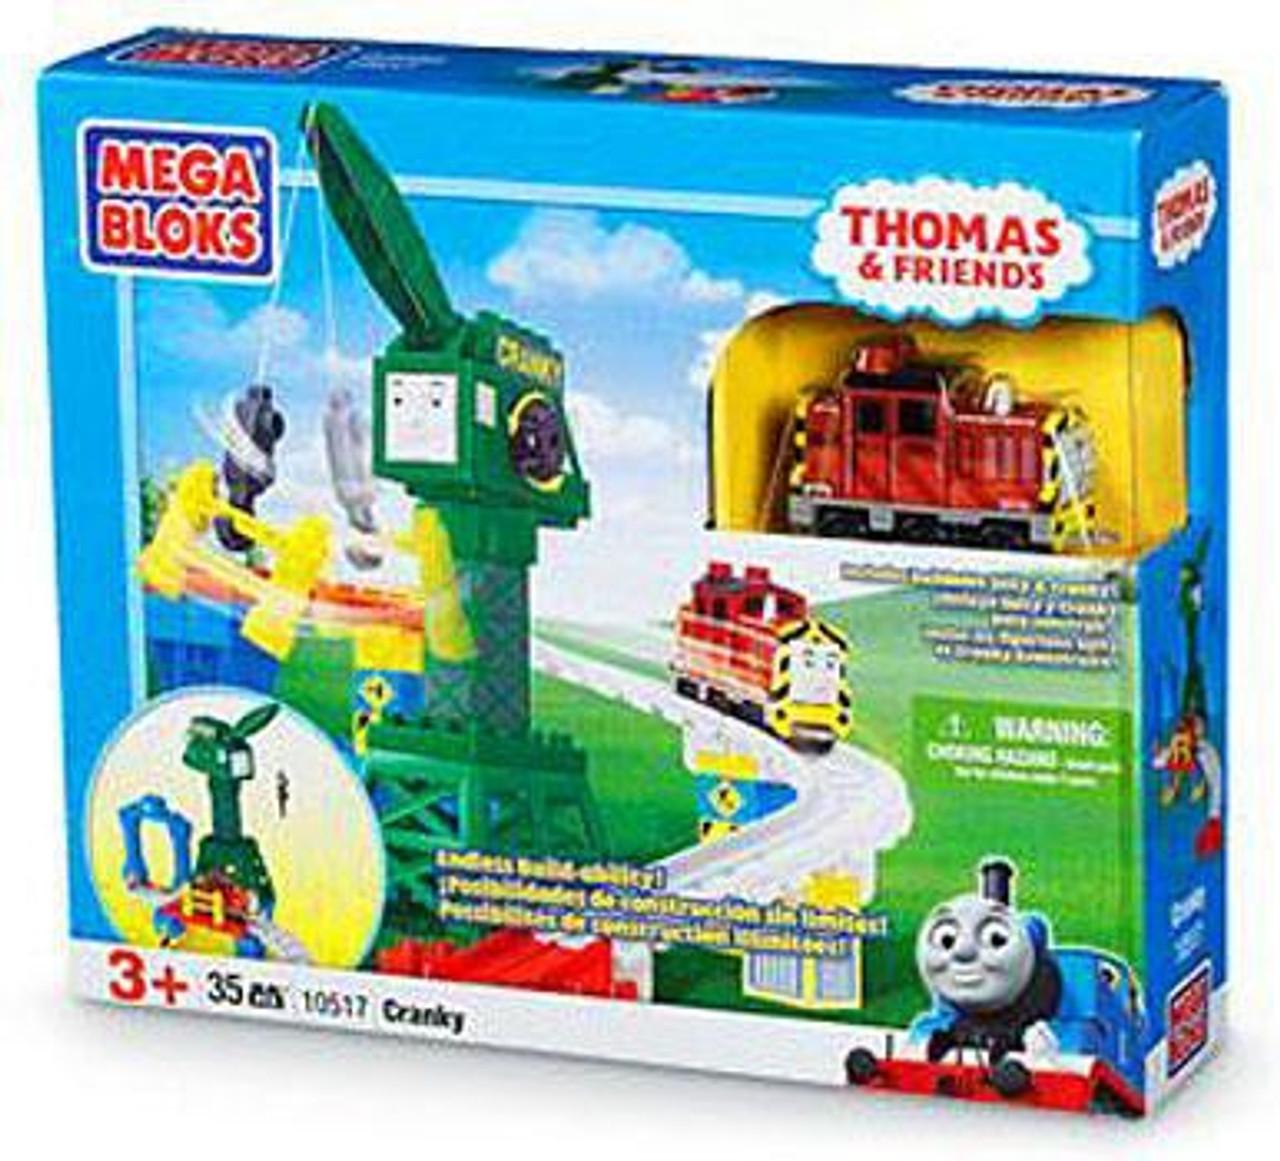 Mega Bloks Thomas & Friends Cranky Set #10517